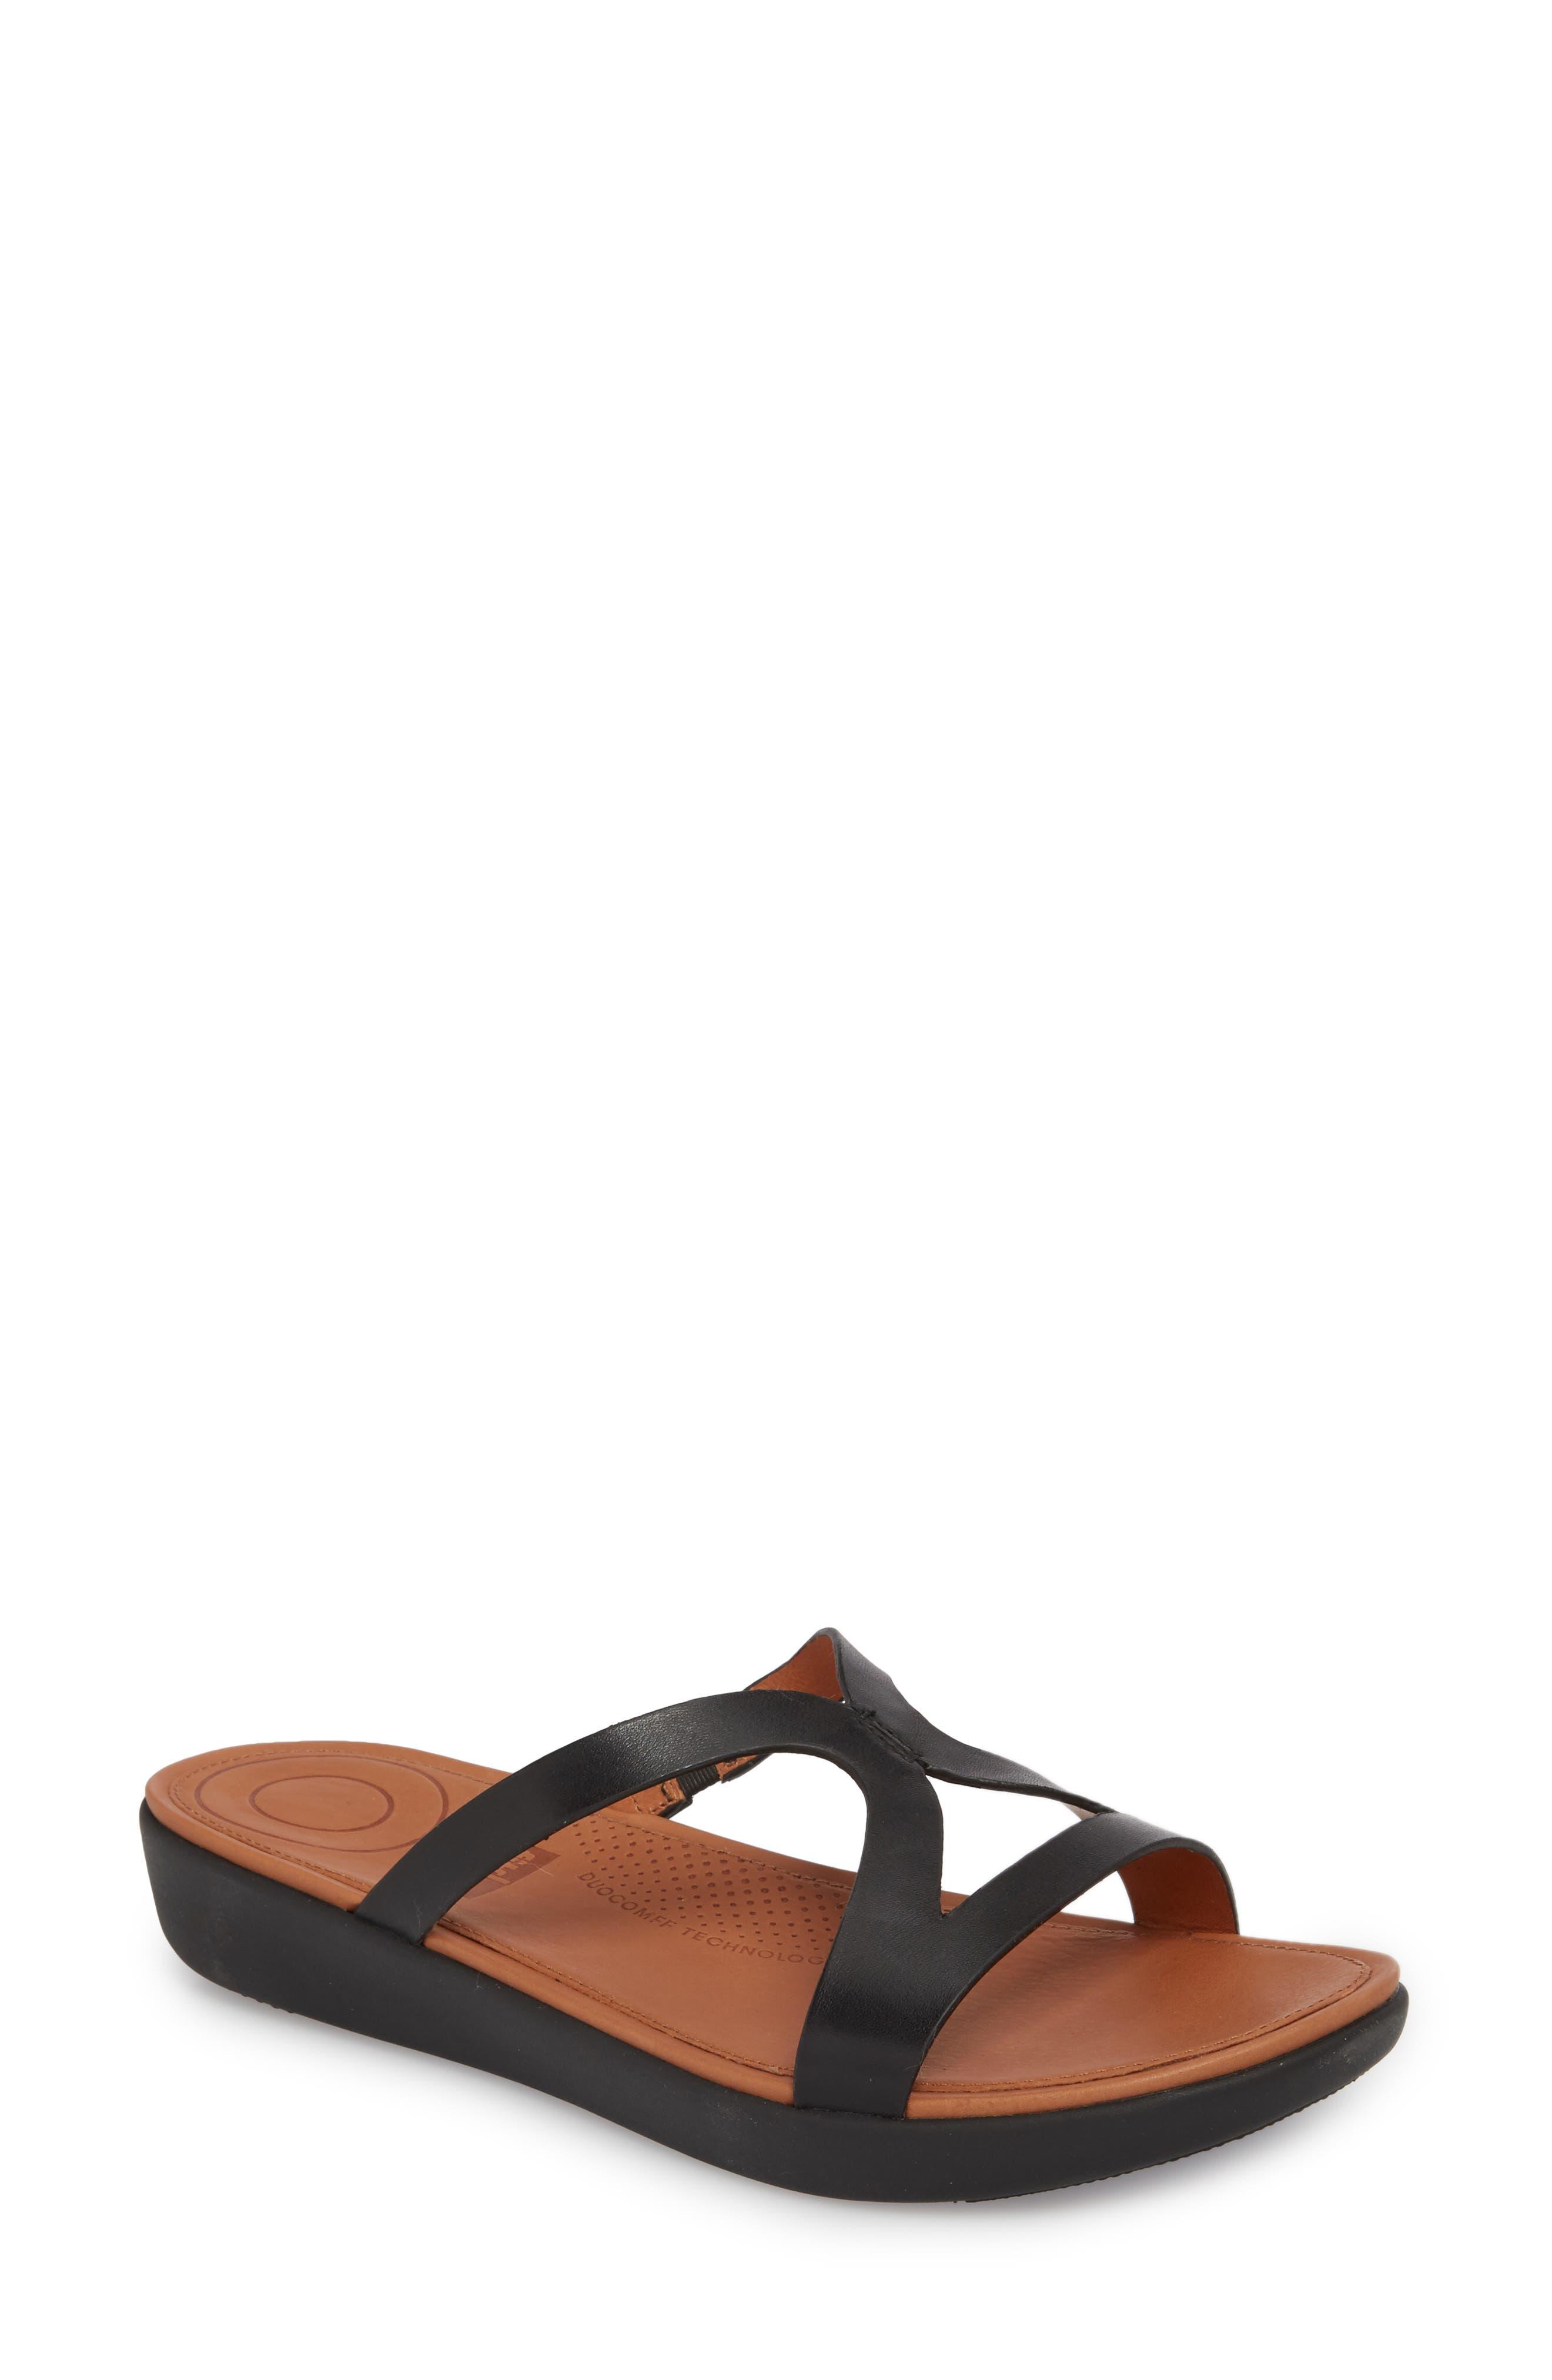 FITFLOP,                             Strata Slide Sandals,                             Main thumbnail 1, color,                             001